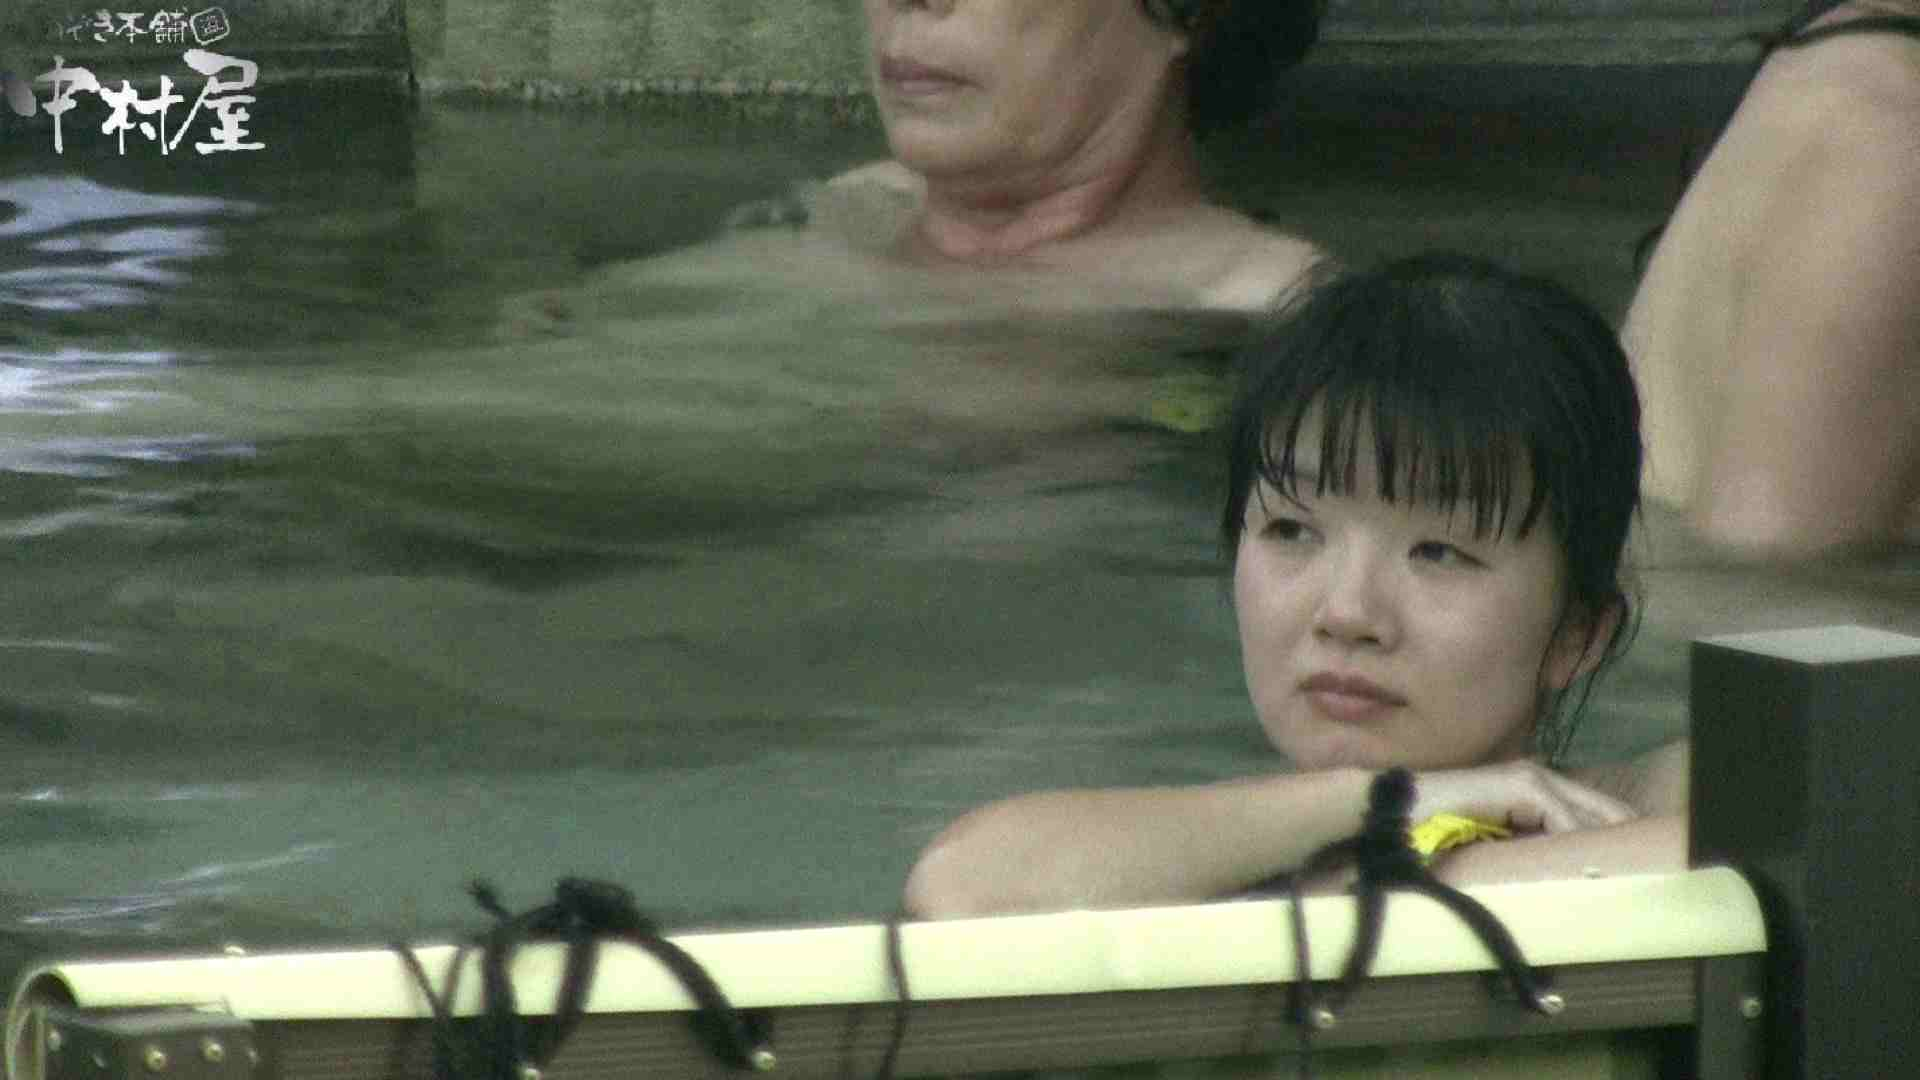 Aquaな露天風呂Vol.904 OL  60連発 19